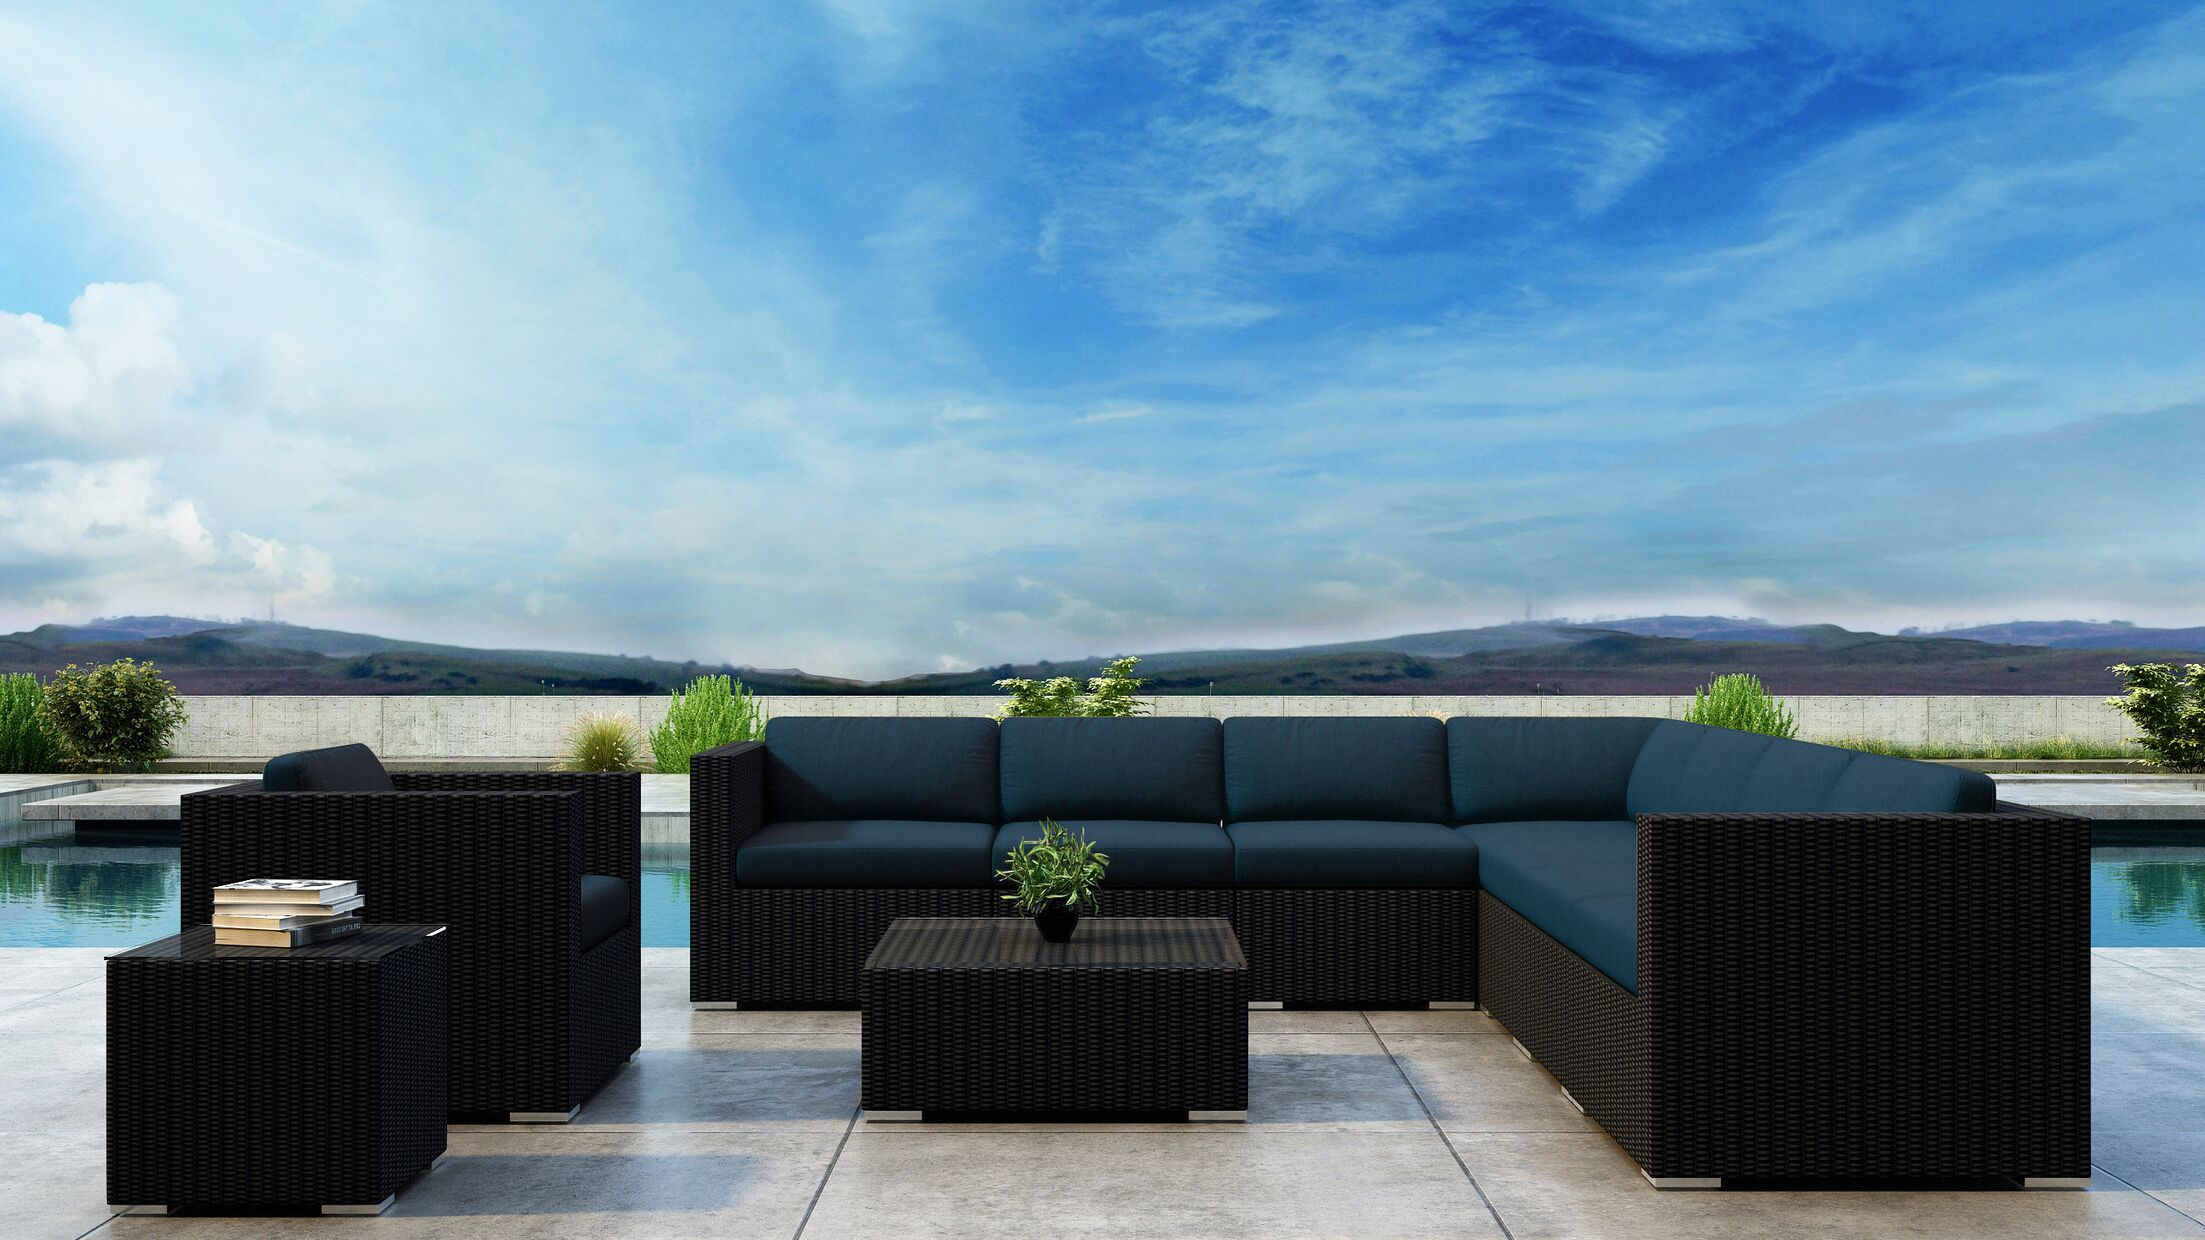 Glendale 10 Piece Sectional Set with Sunbrella Cushion Cushion Color: Spectrum Indigo